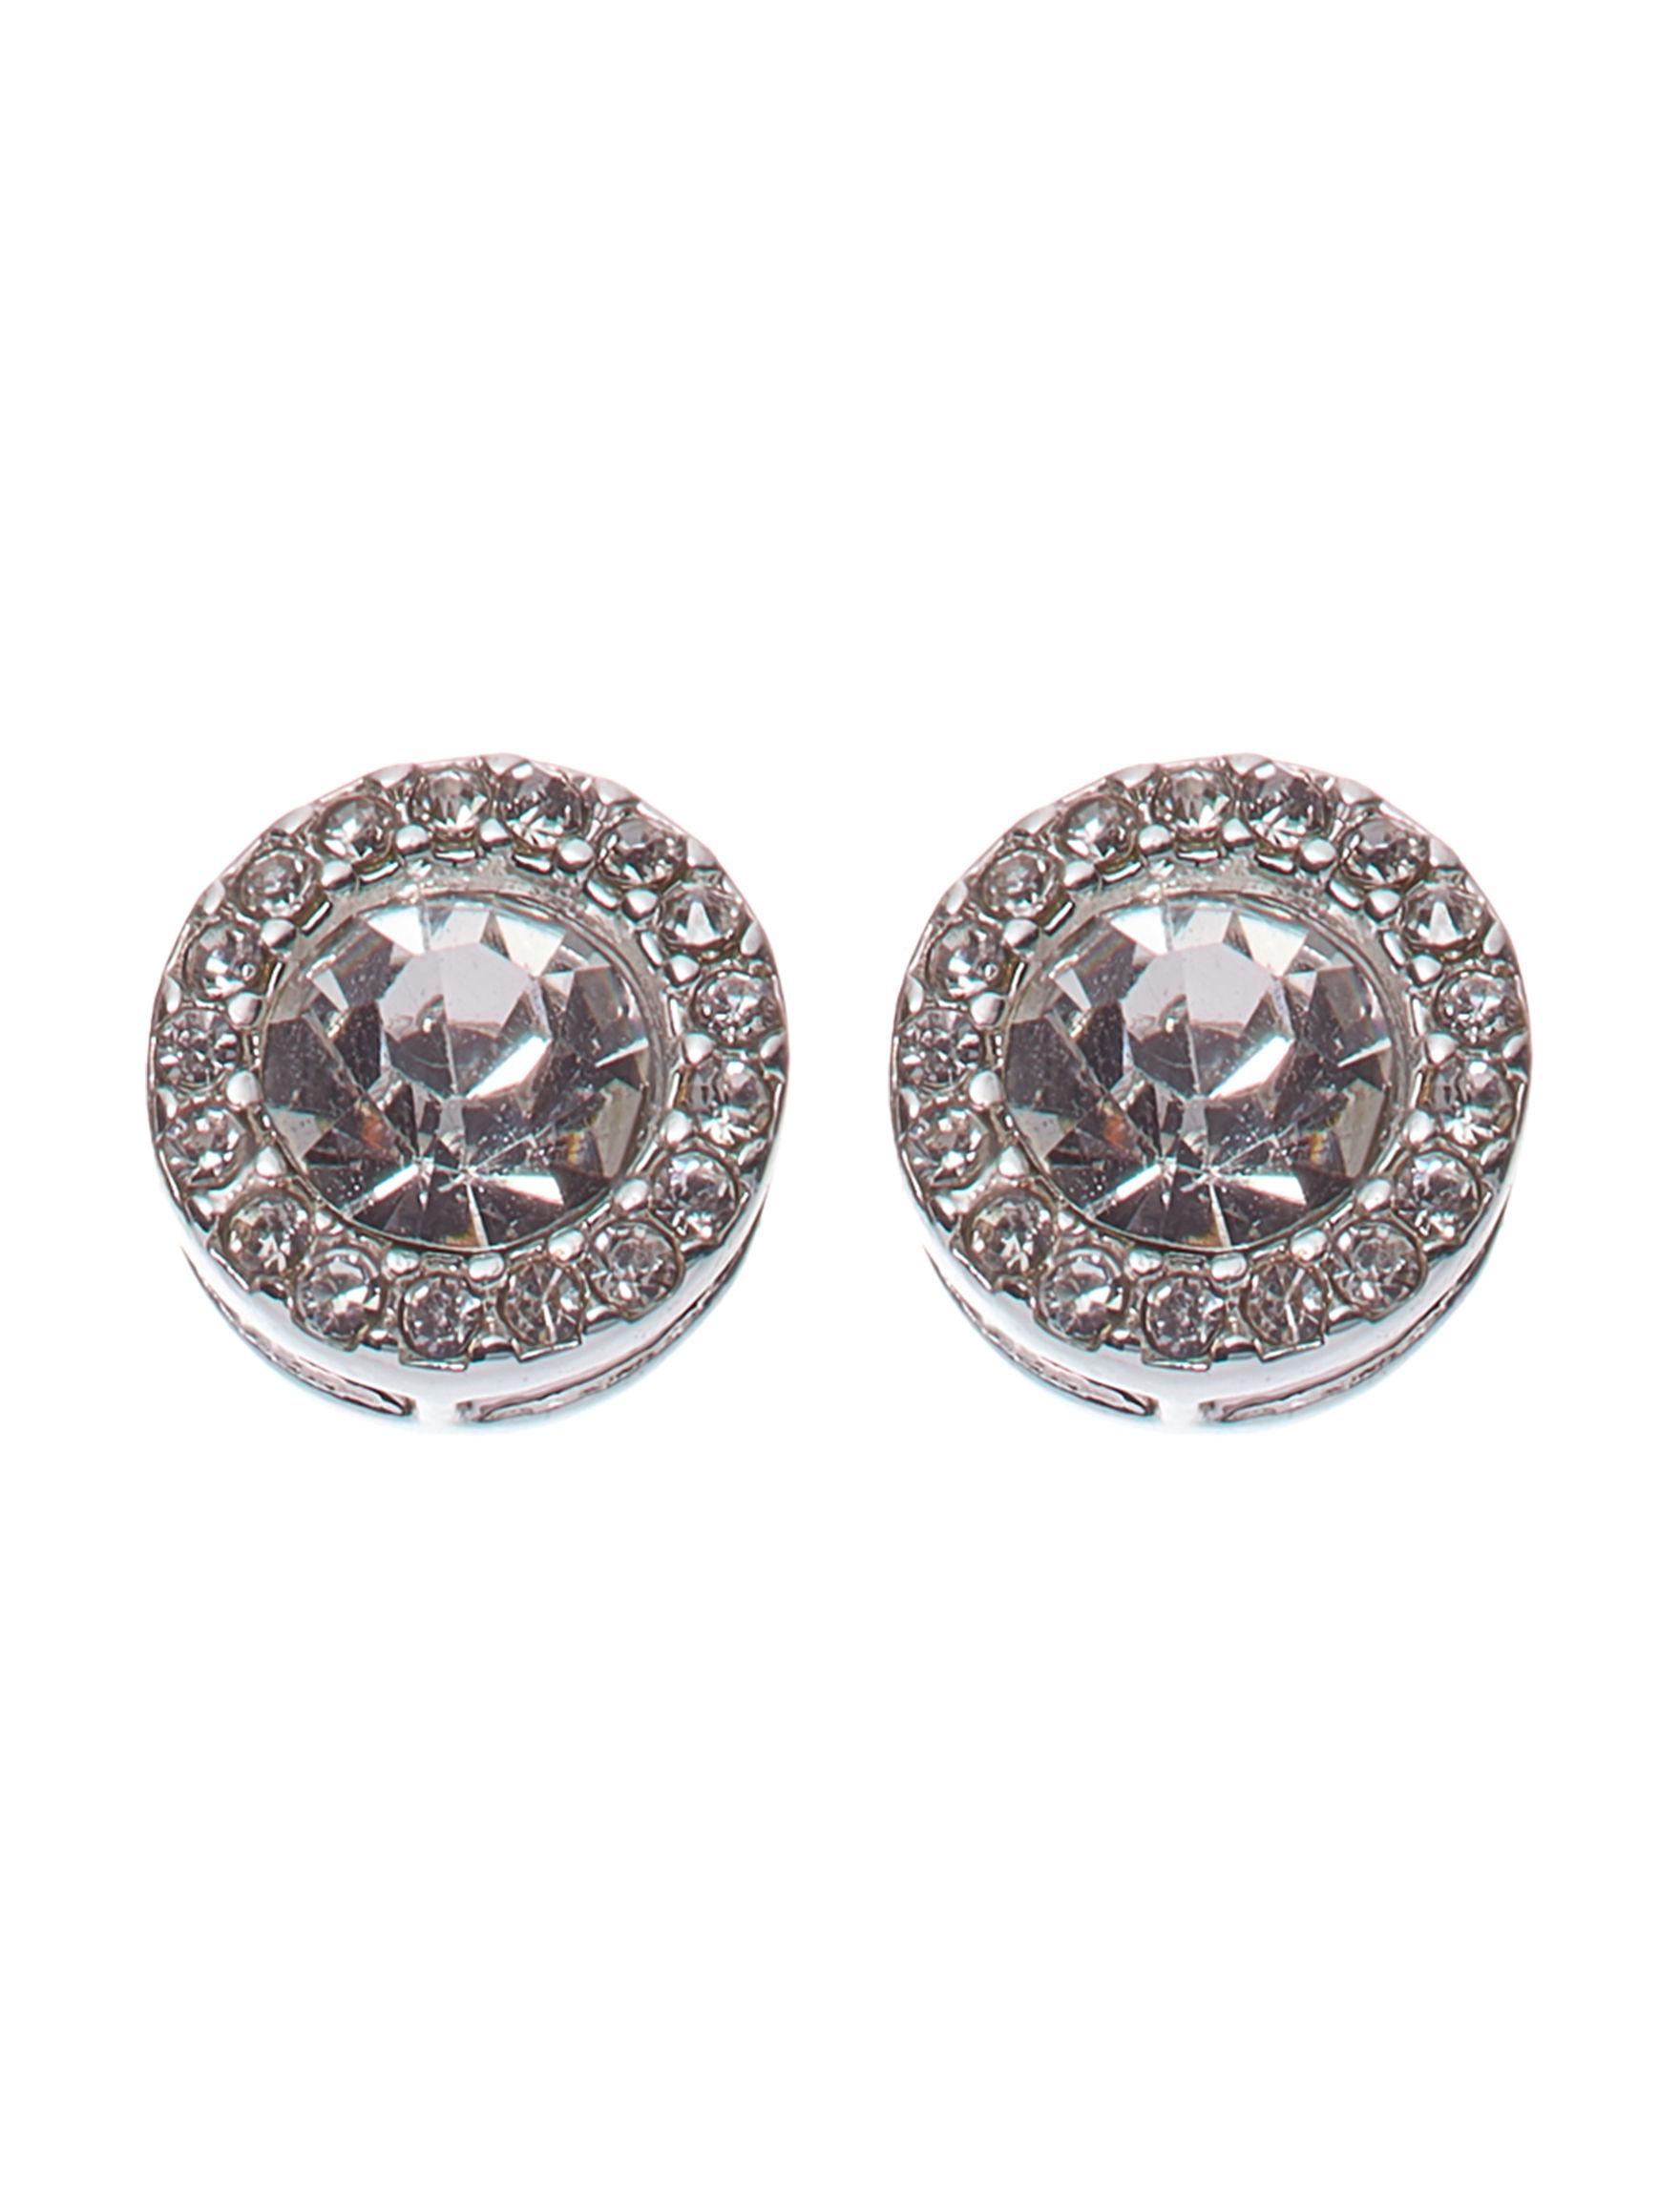 Gloria Vanderbilt Silver Studs Earrings Fashion Jewelry